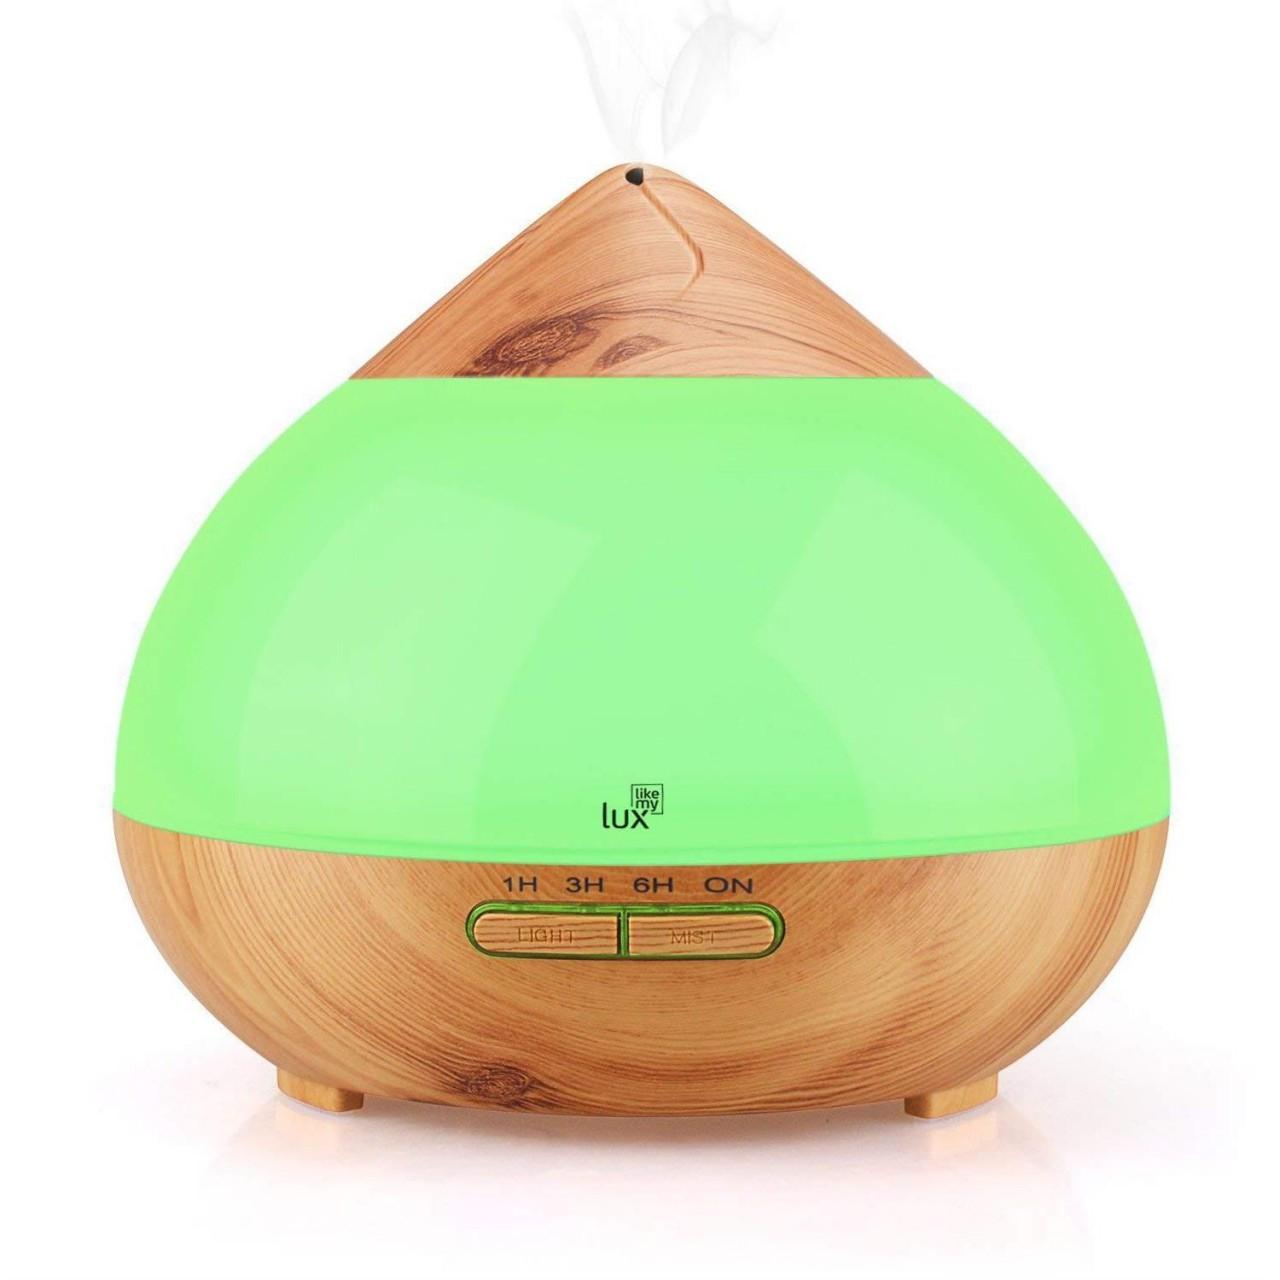 Aroma Diffuser Likemylux 300ml Luftbefeuchter Ultraschall Öl Diffusor LED braun